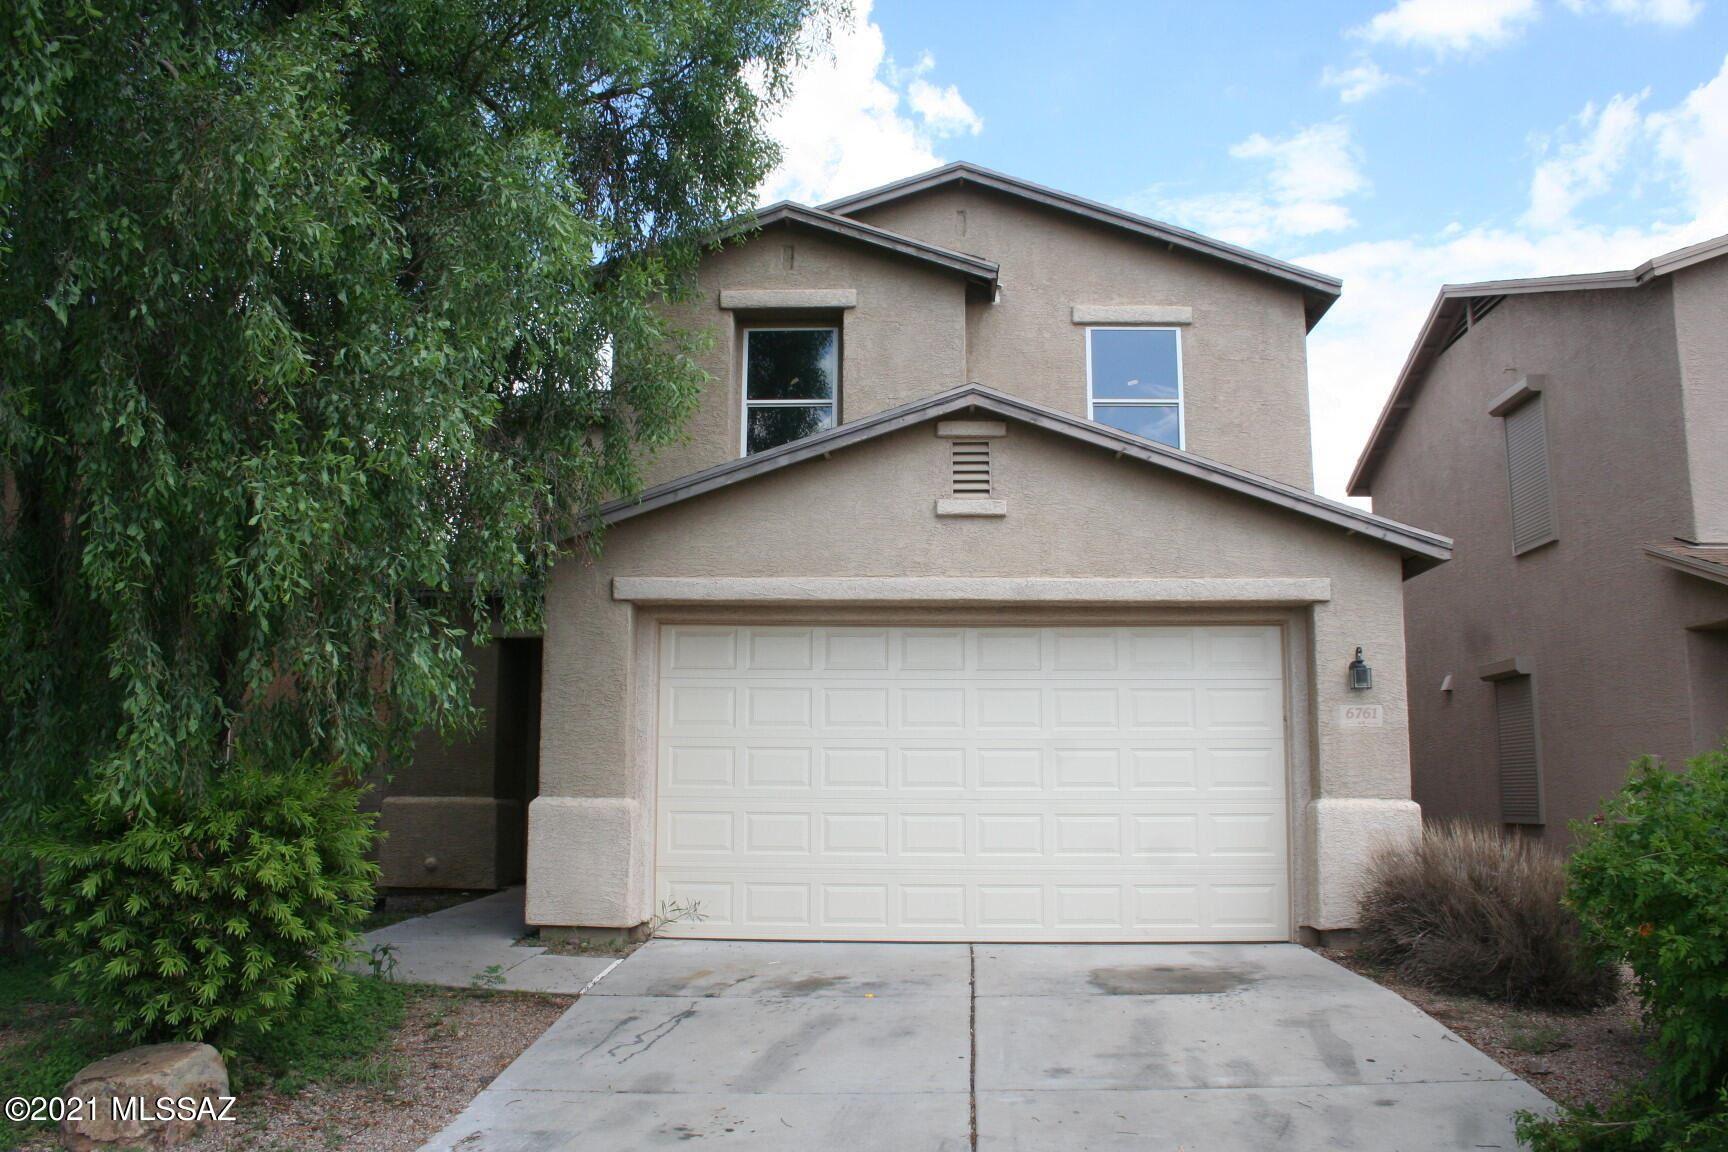 6761 S Parliament Drive, Tucson, AZ 85756 - MLS#: 22121405